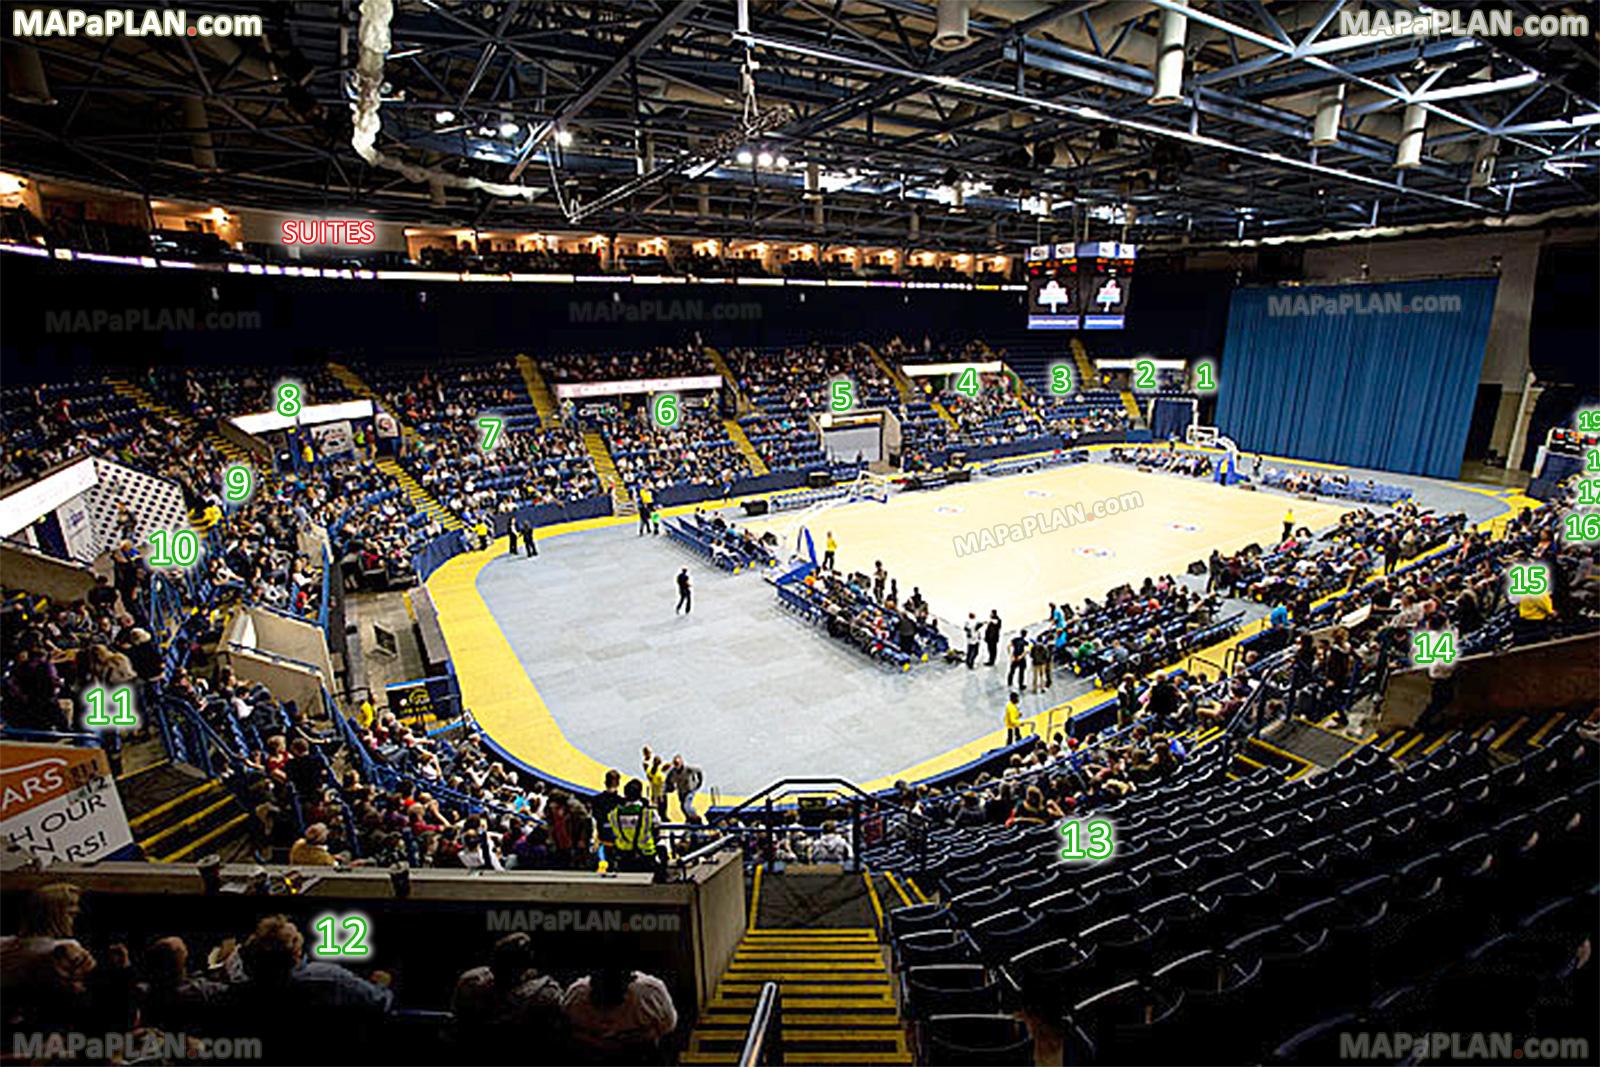 Nottingham Motorpoint Arena Seat